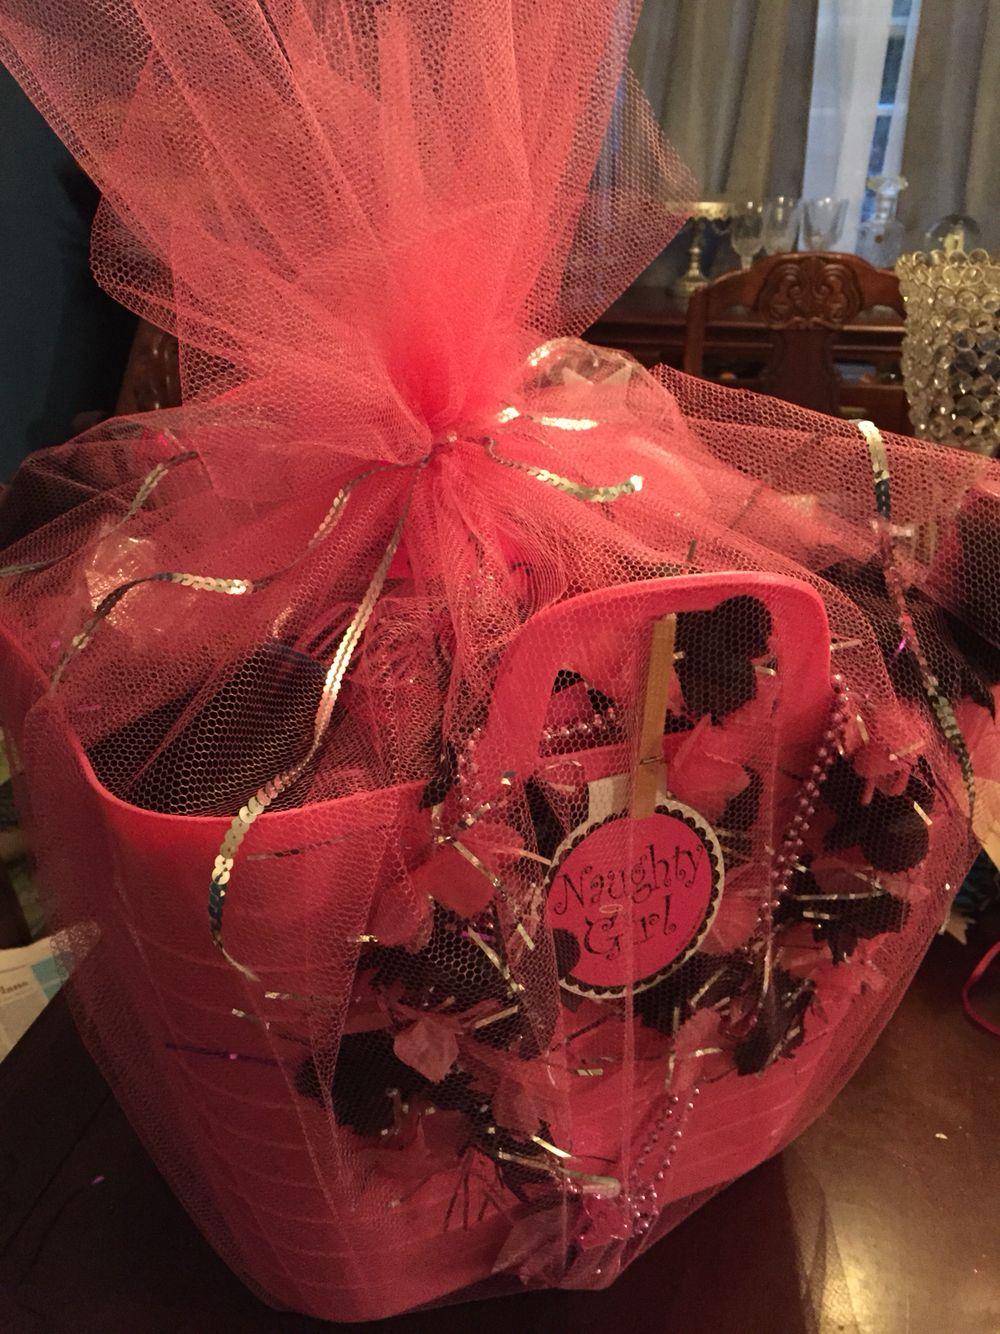 Bachelorette gift basket with images bachelorette gift